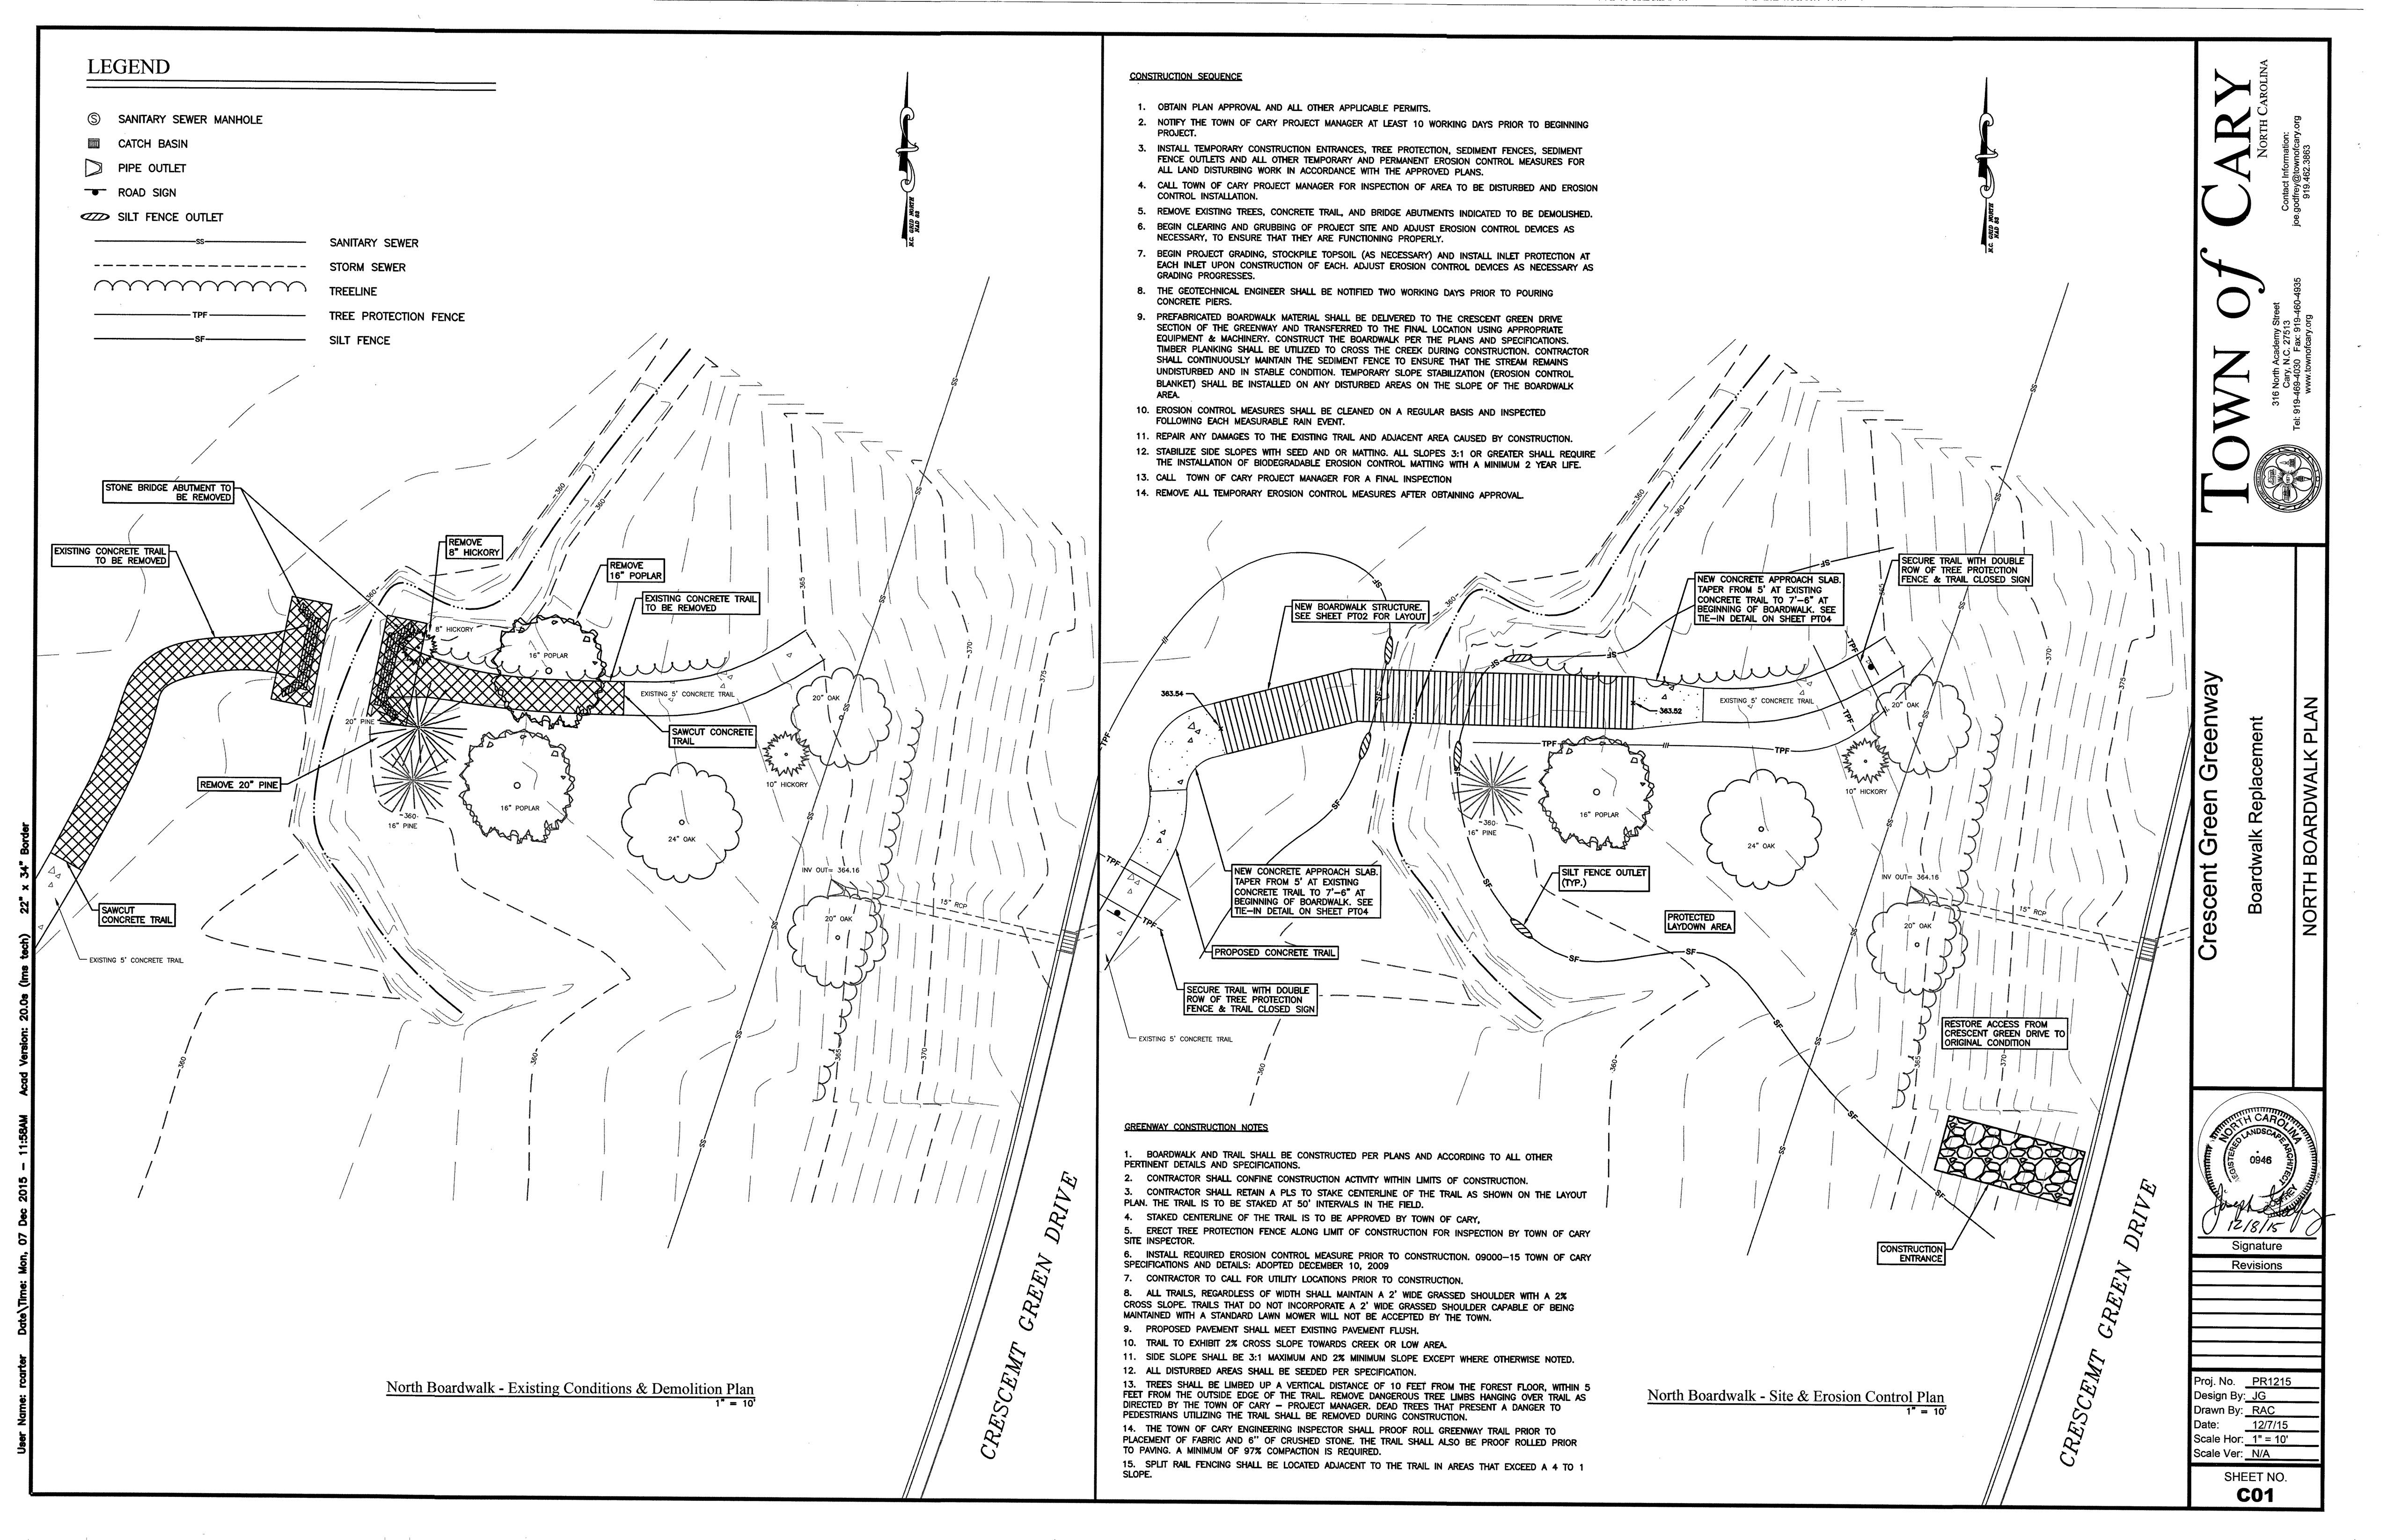 Crescent_Green_Greenway_Construction_Drawings_Cary_NC_pg2.jpg